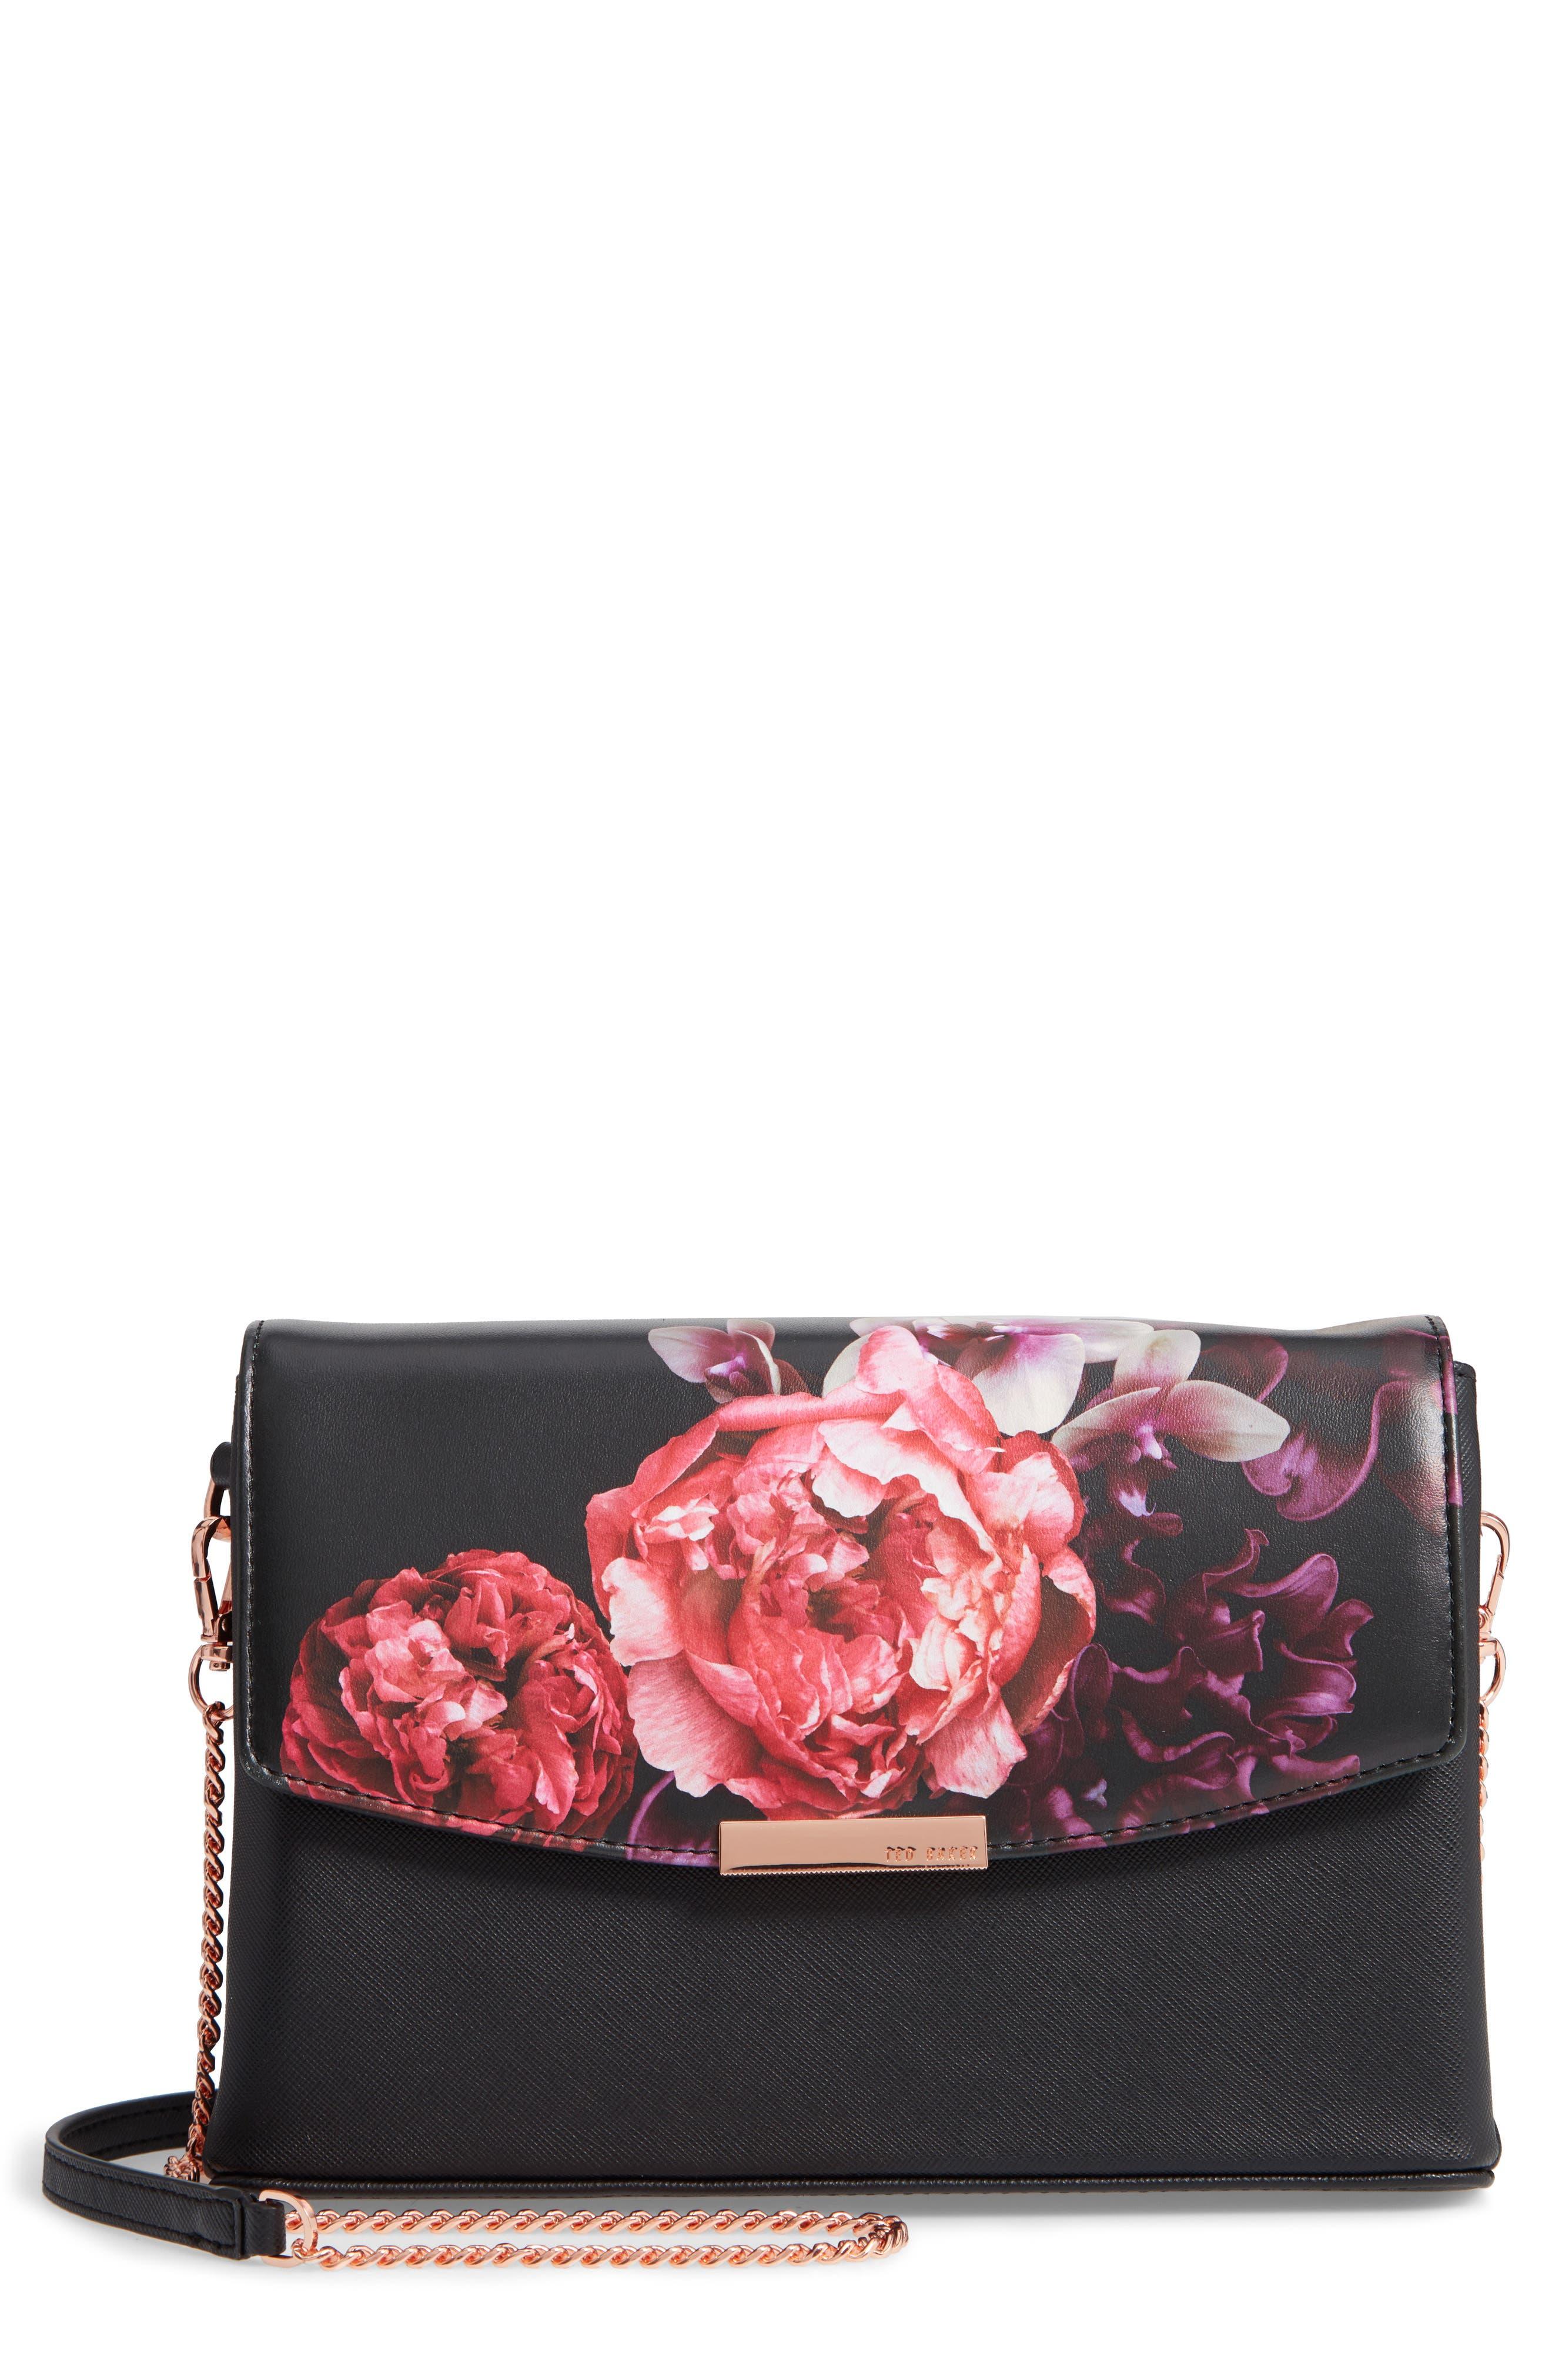 Viickky Splendour Print Faux Leather Crossbody Bag,                             Main thumbnail 1, color,                             BLACK